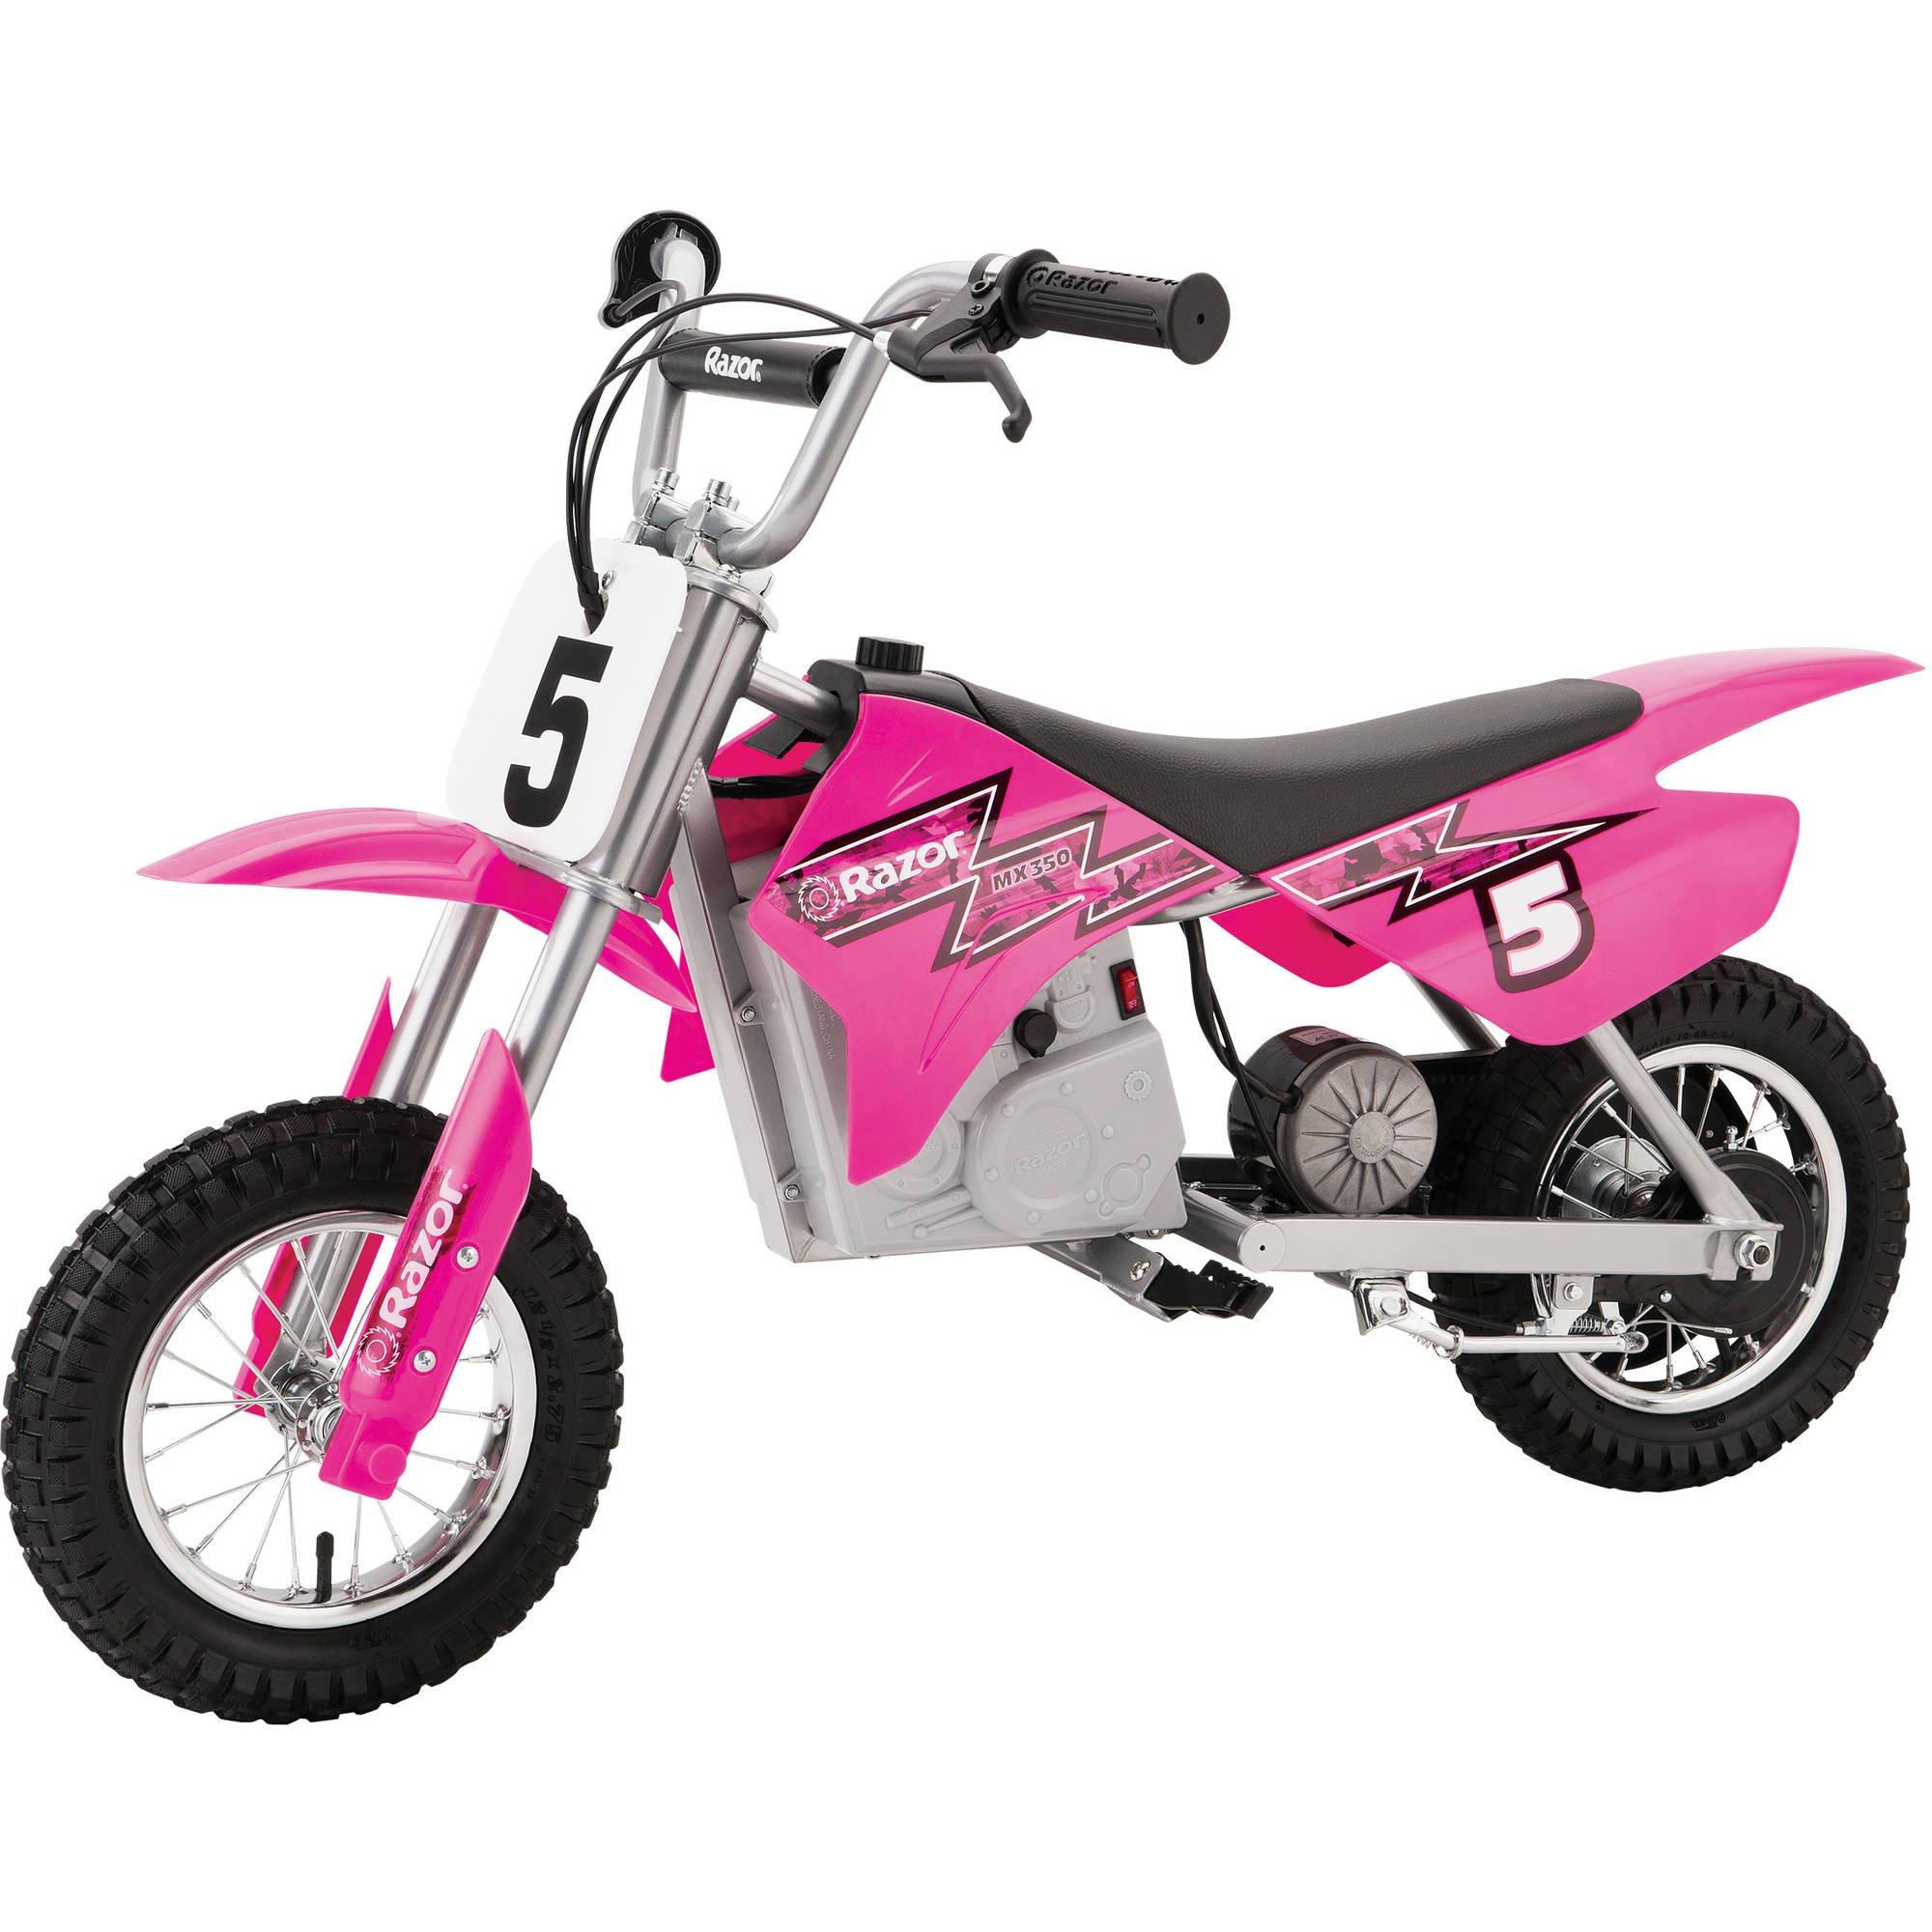 Razor MX350 24-Volt Dirt Rocket Electric Motocross Mini Bike - Pink